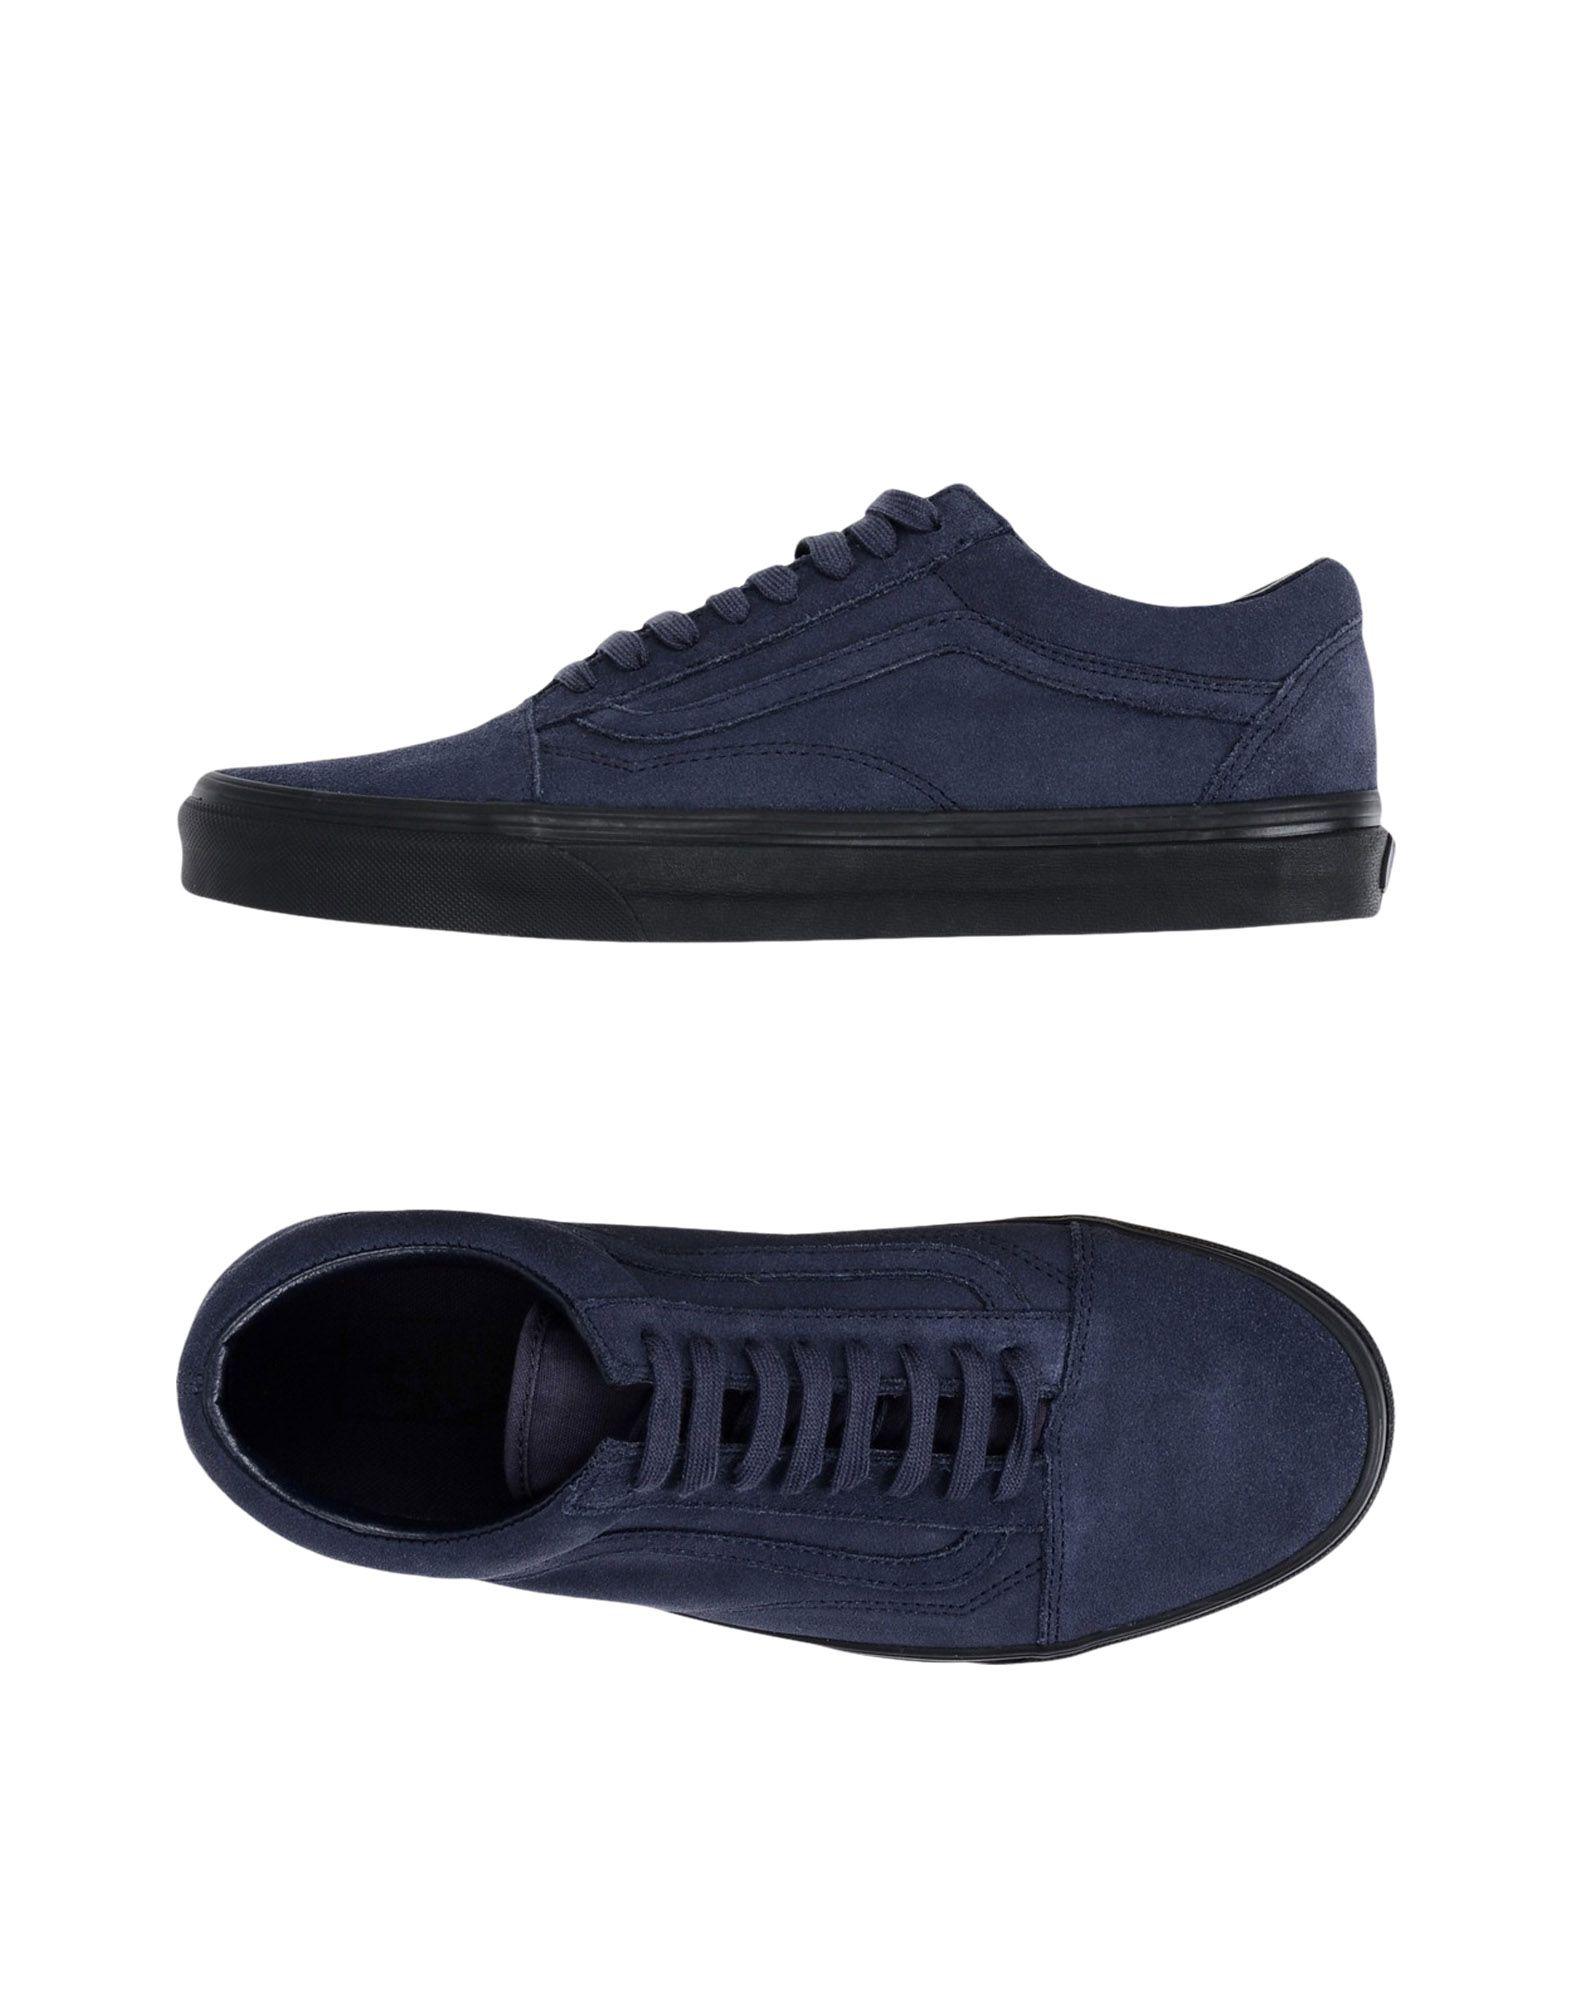 Rabatt echte Schuhe Vans Ua 11332515NX Old Skool 11332515NX Ua 002653